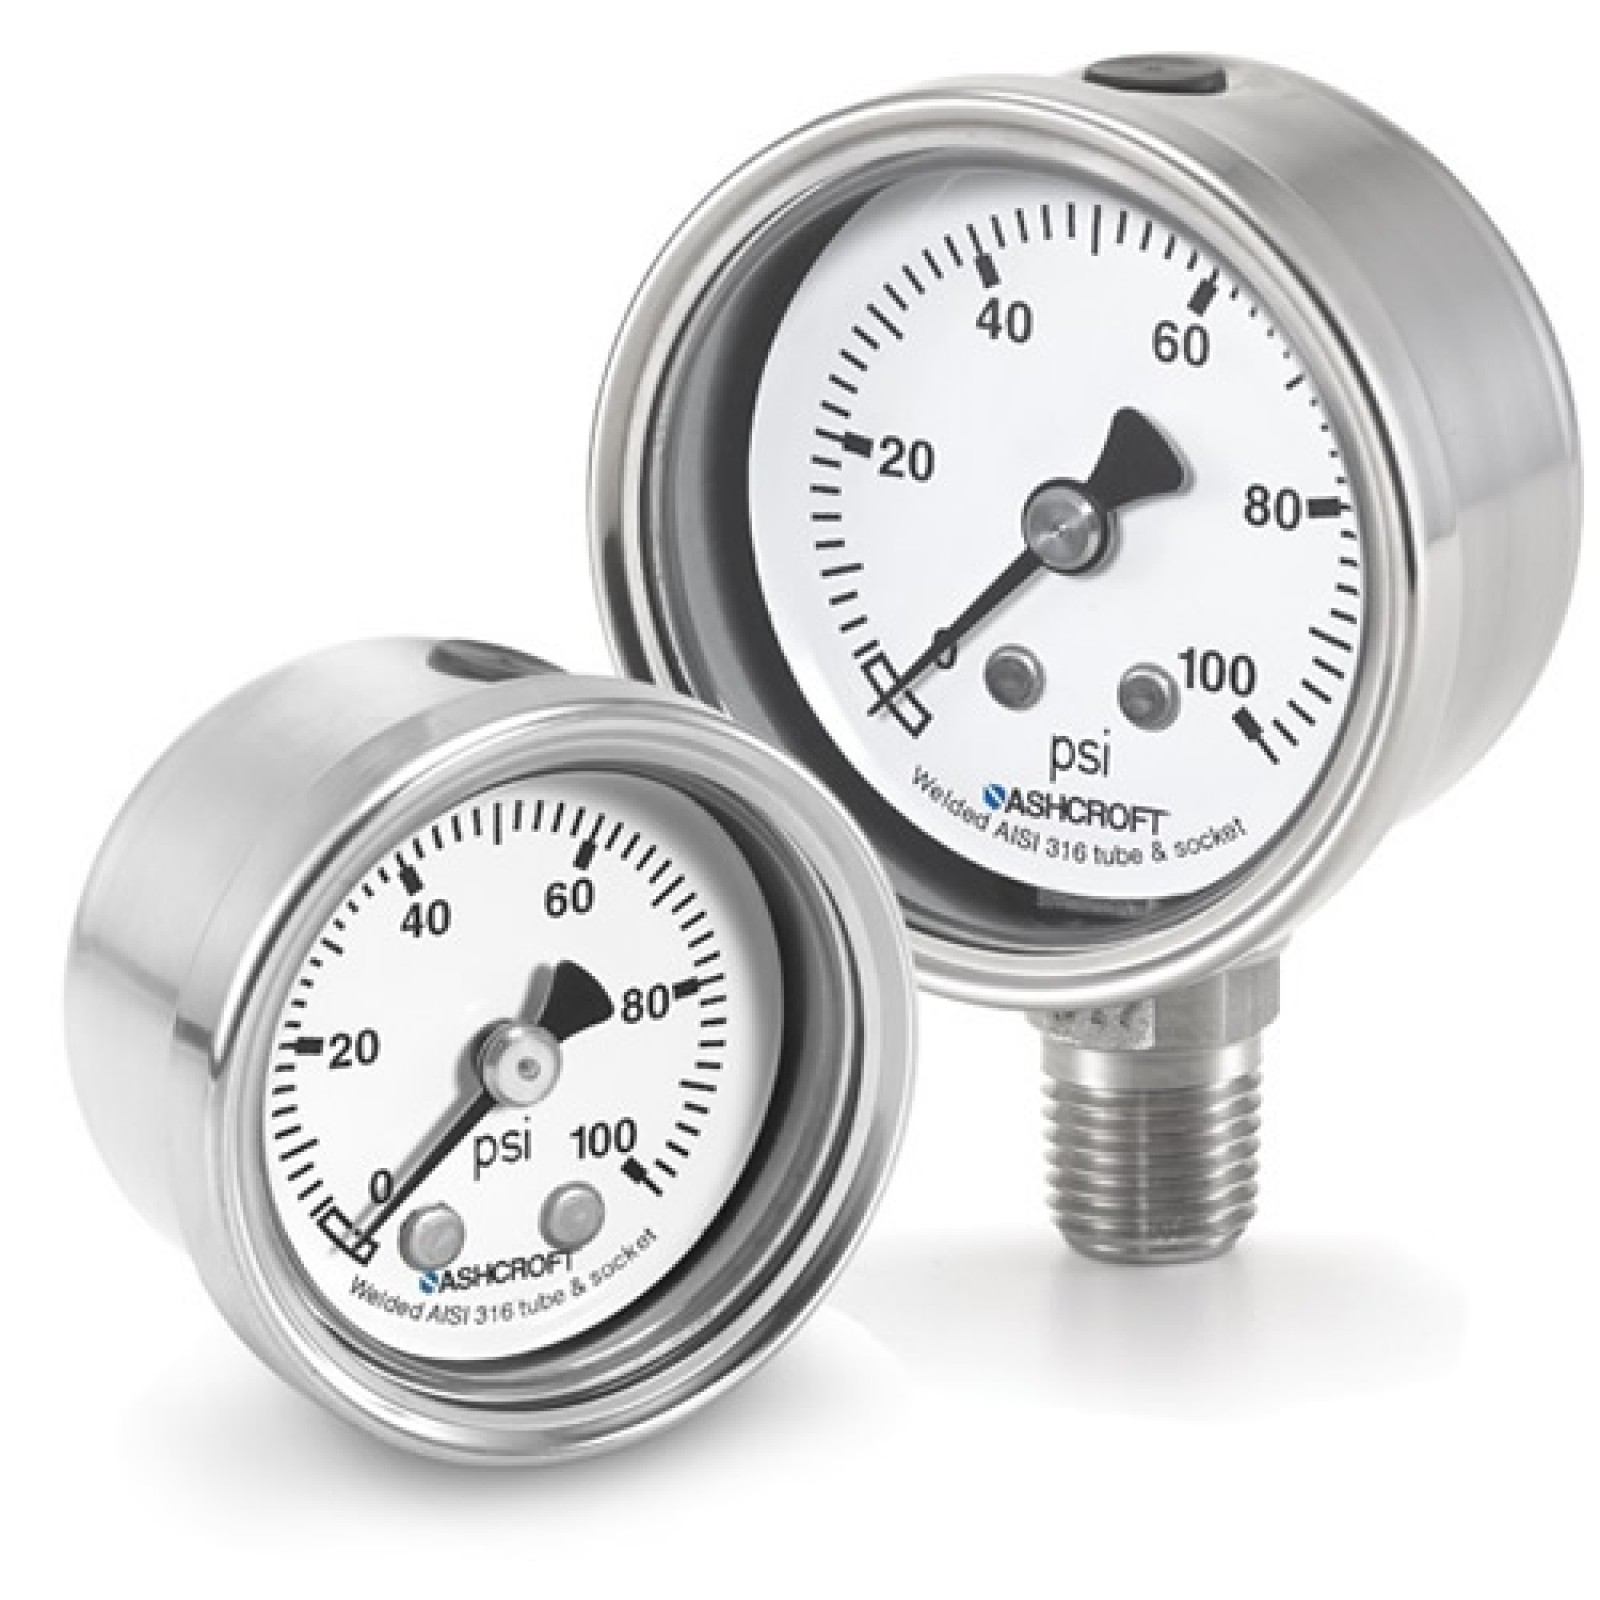 "63 1008S 02L 60#/KP - Pressure Gauge, 63mm stainless 1/4"" NPT Lower conn & Case, 0/60 psi"